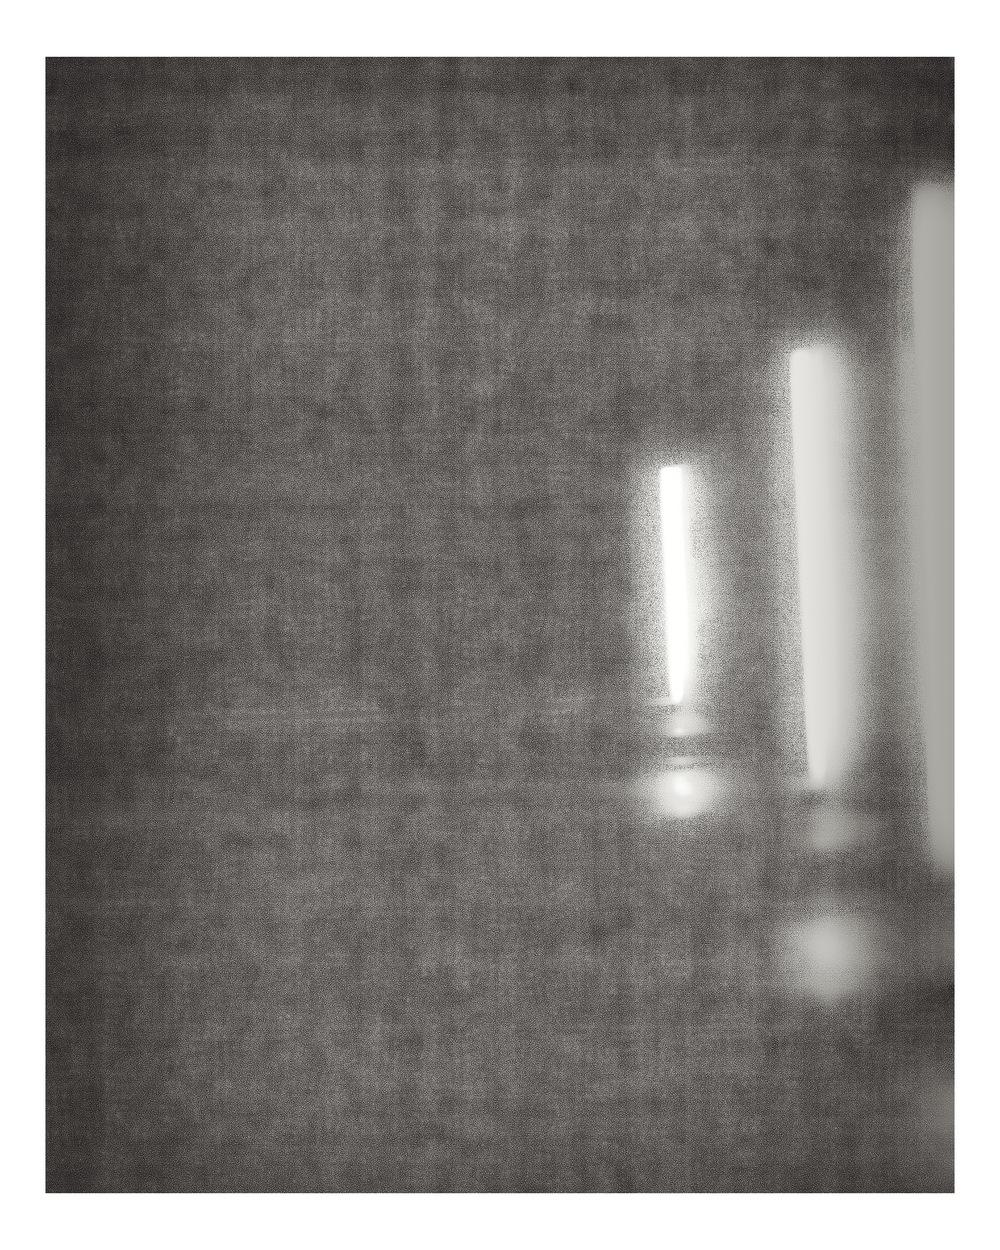 08 Untitled (1).jpg